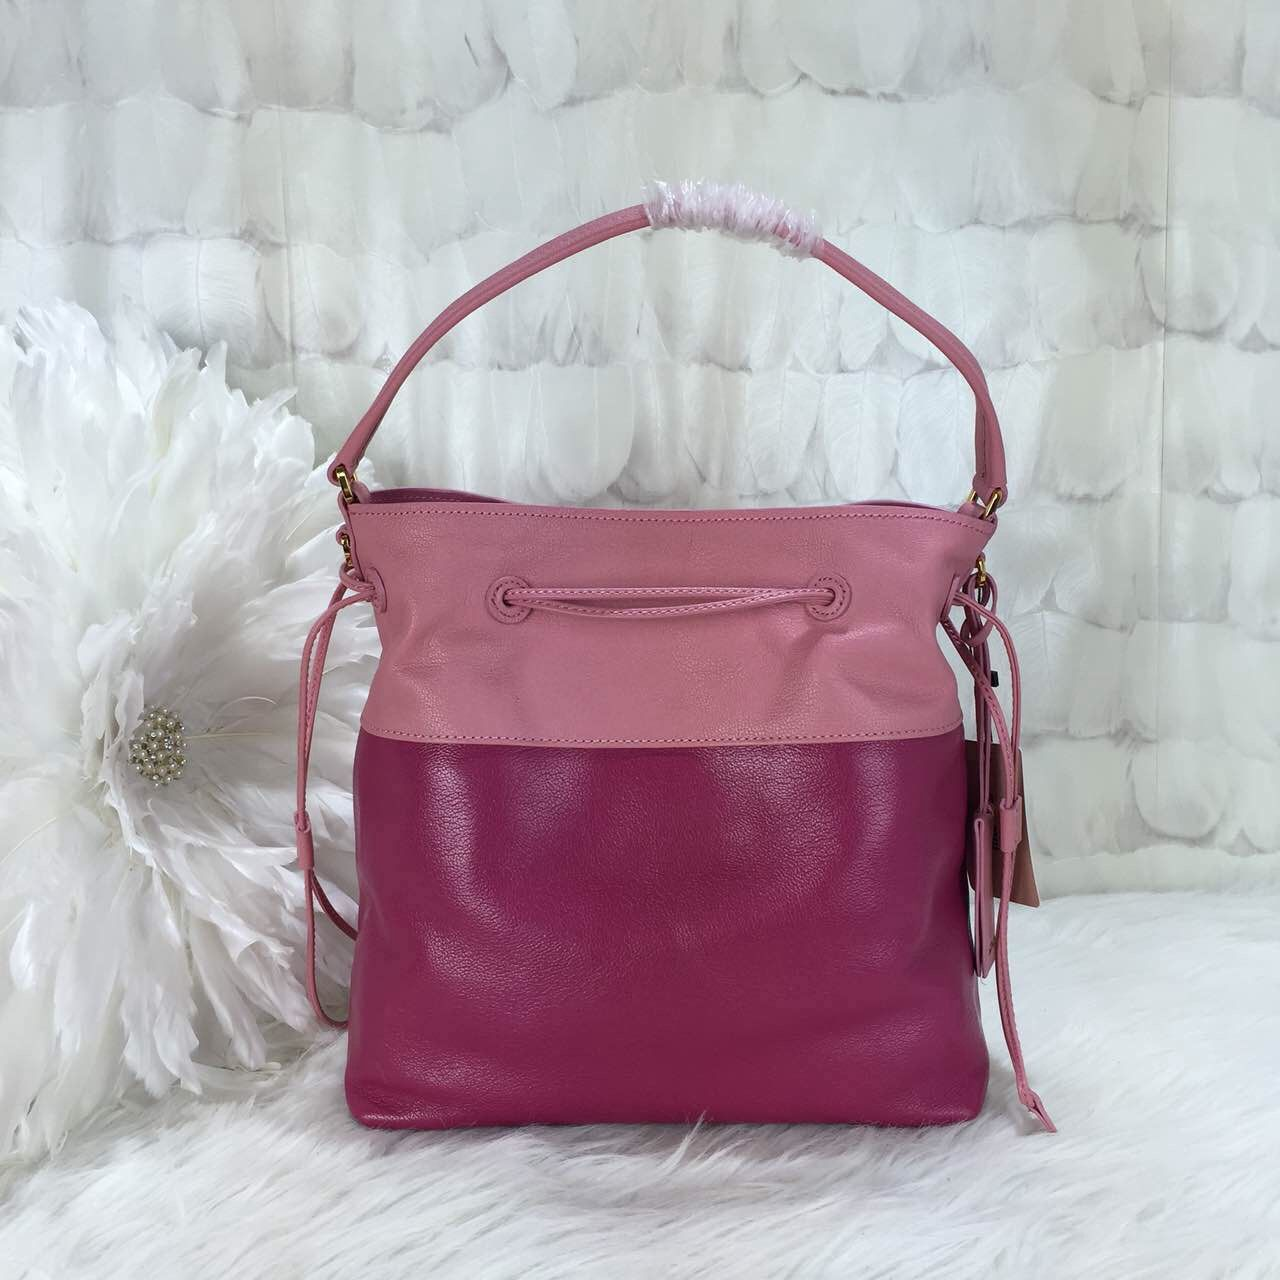 Miu Miu Leather Hobo Bag Sky Blue 2015   Miu Miu Bags - Cross body bags,  wallets   more in 2019   Pinterest   Bags, Miu miu and Crossbody bag dd99da402f